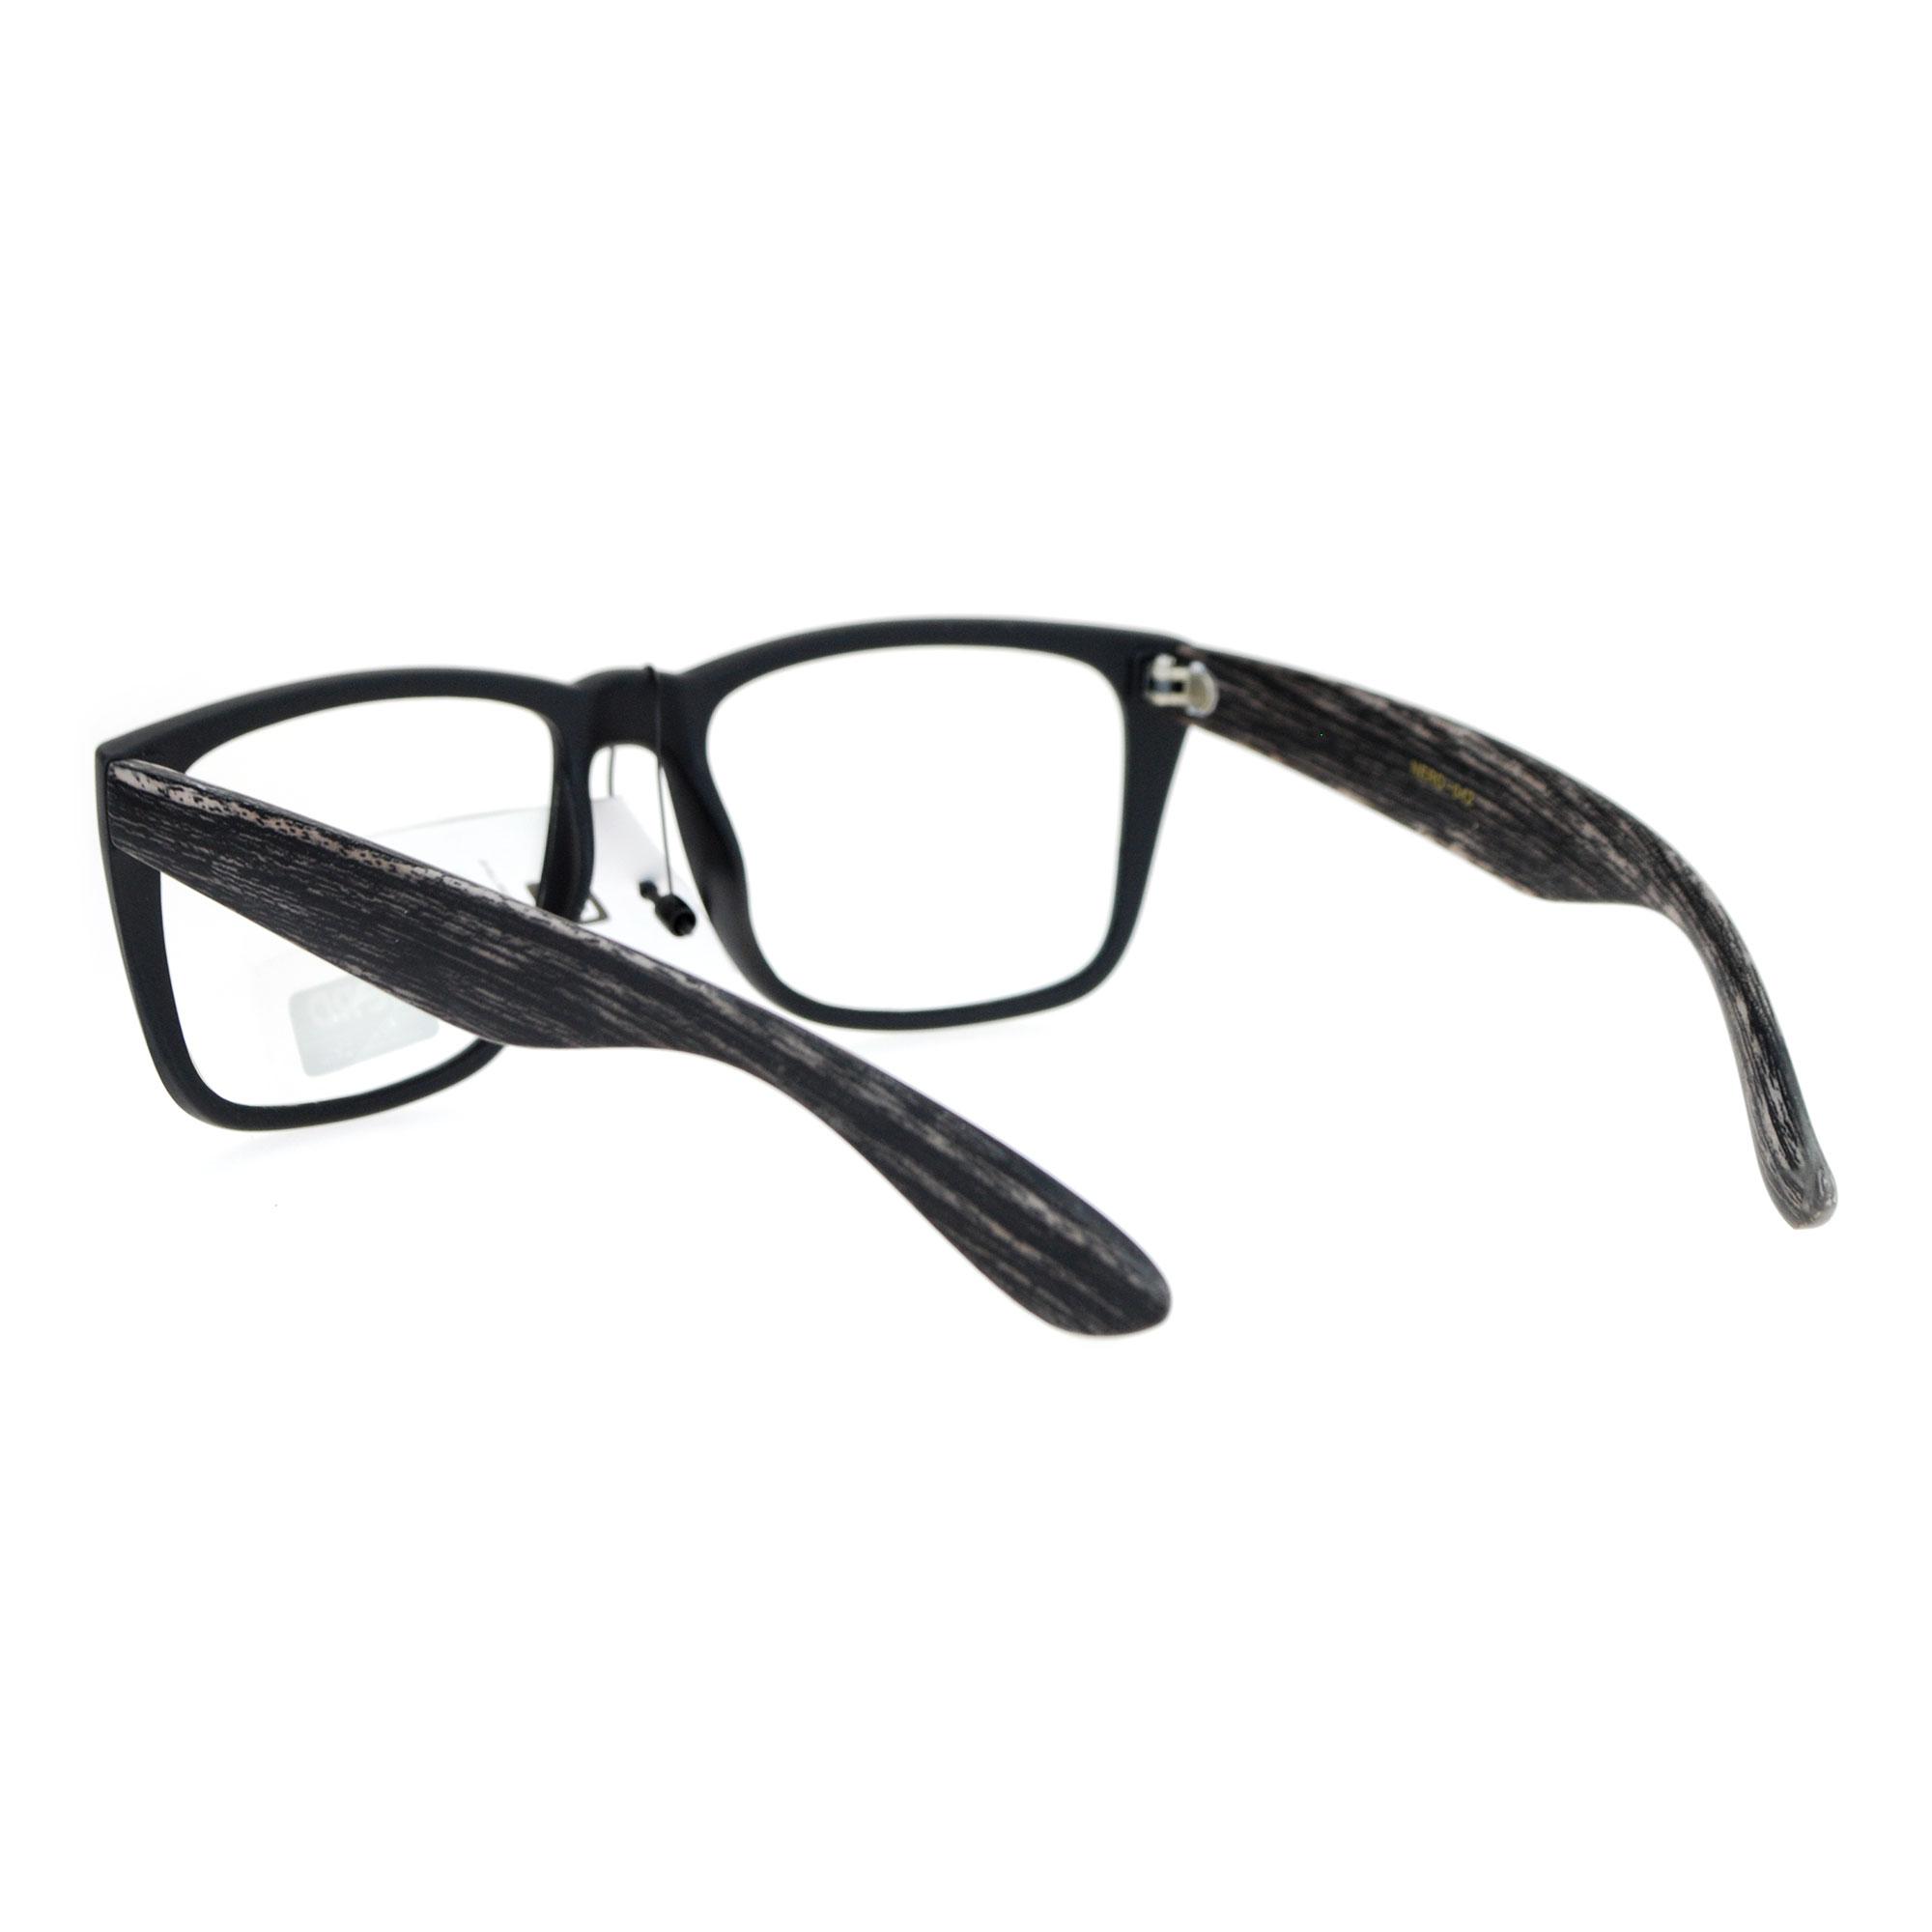 Large Rectangular Glasses Frame : SA106 Wood Grain Arm Large Rectangular Clear Lens Eye ...